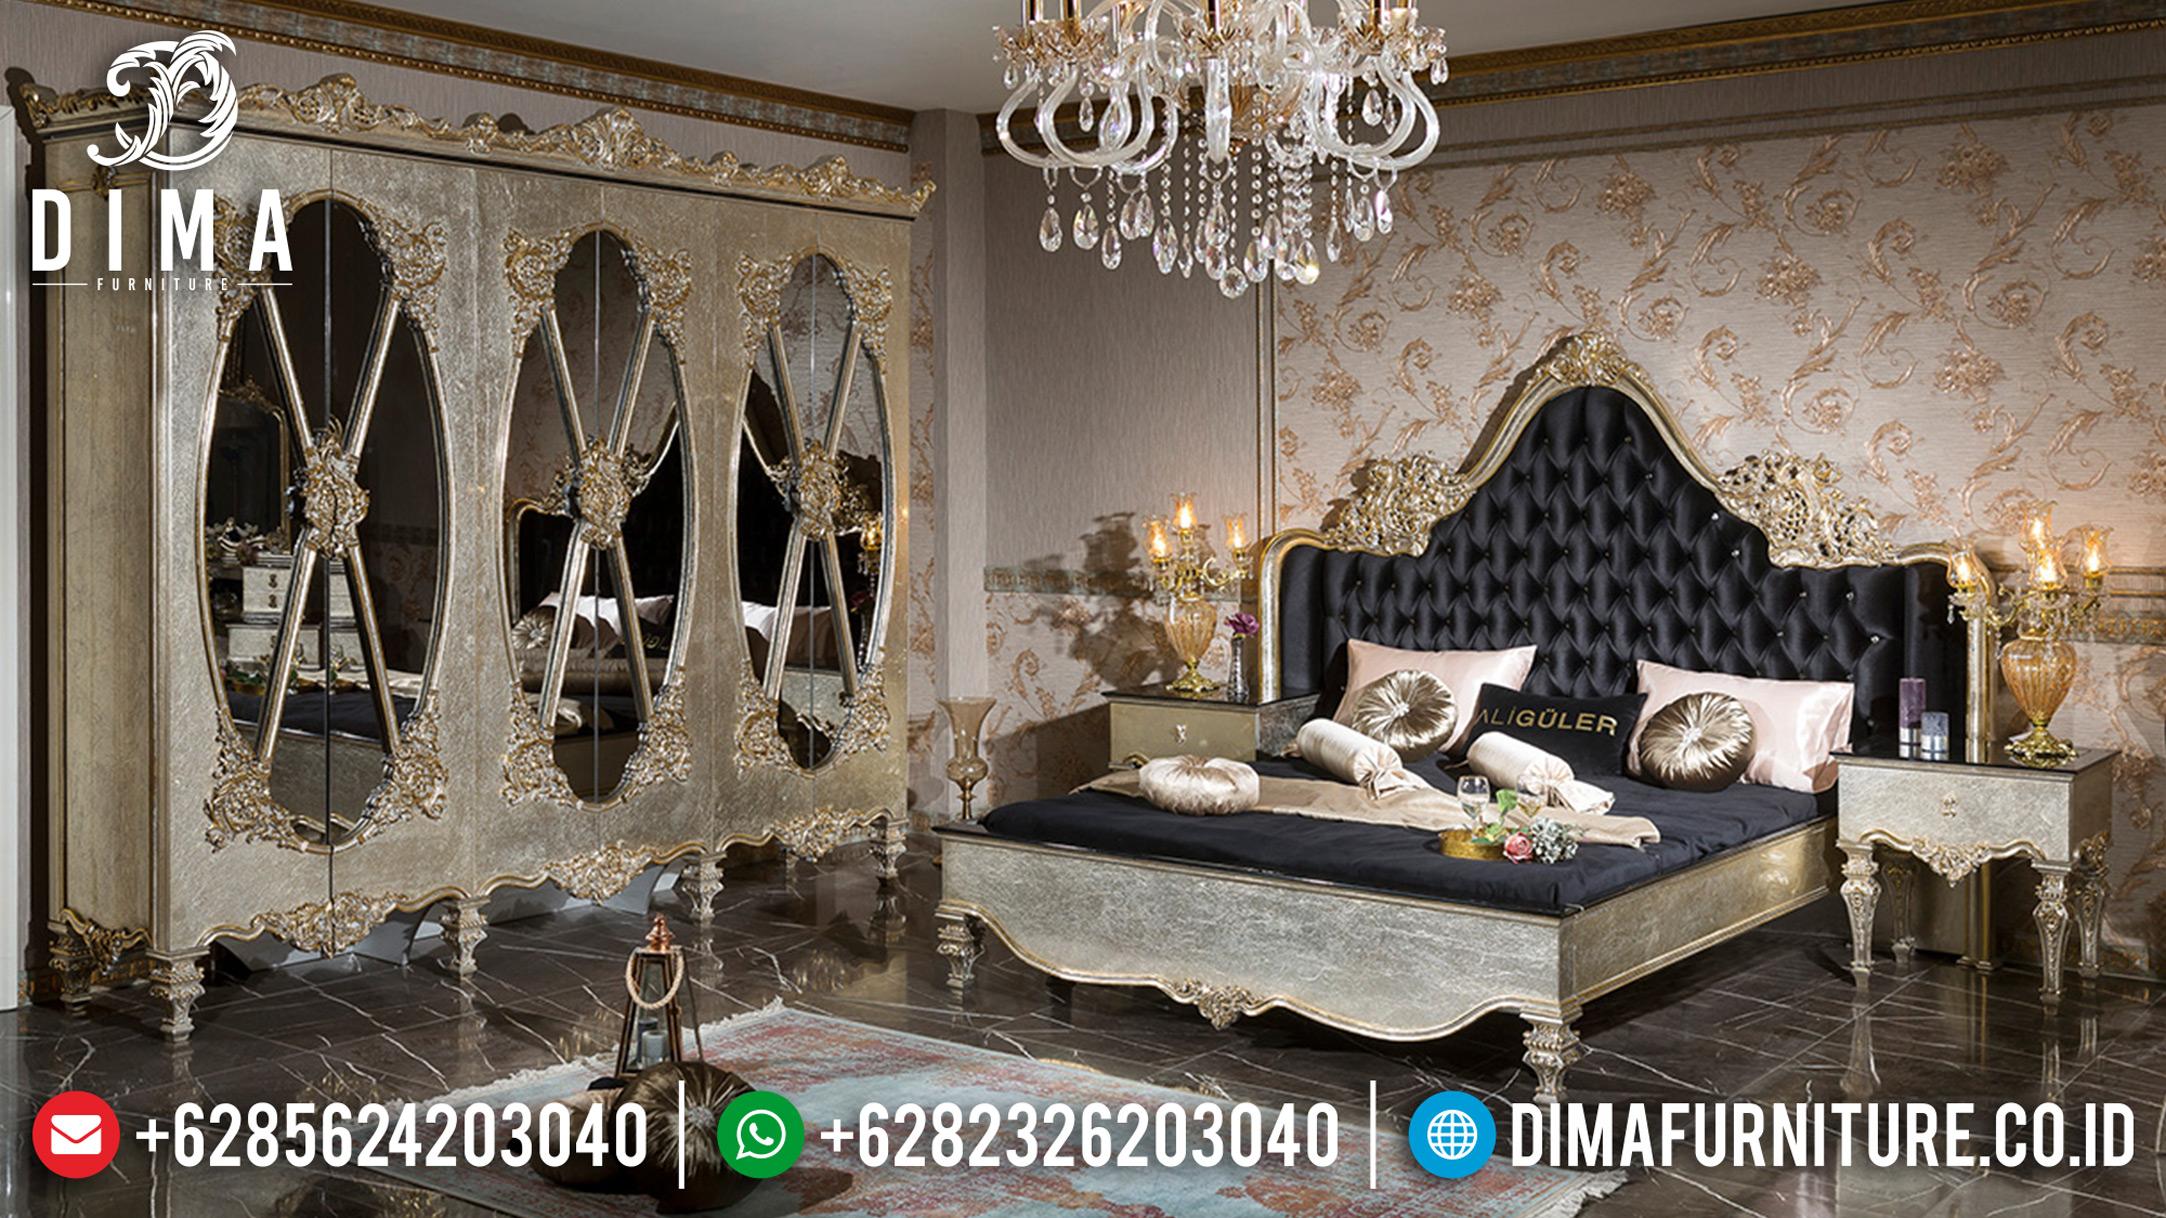 Kamar Set Jepara Exclusive Tempat Tidur Mewah Silver Leaf 2019 DF-0682